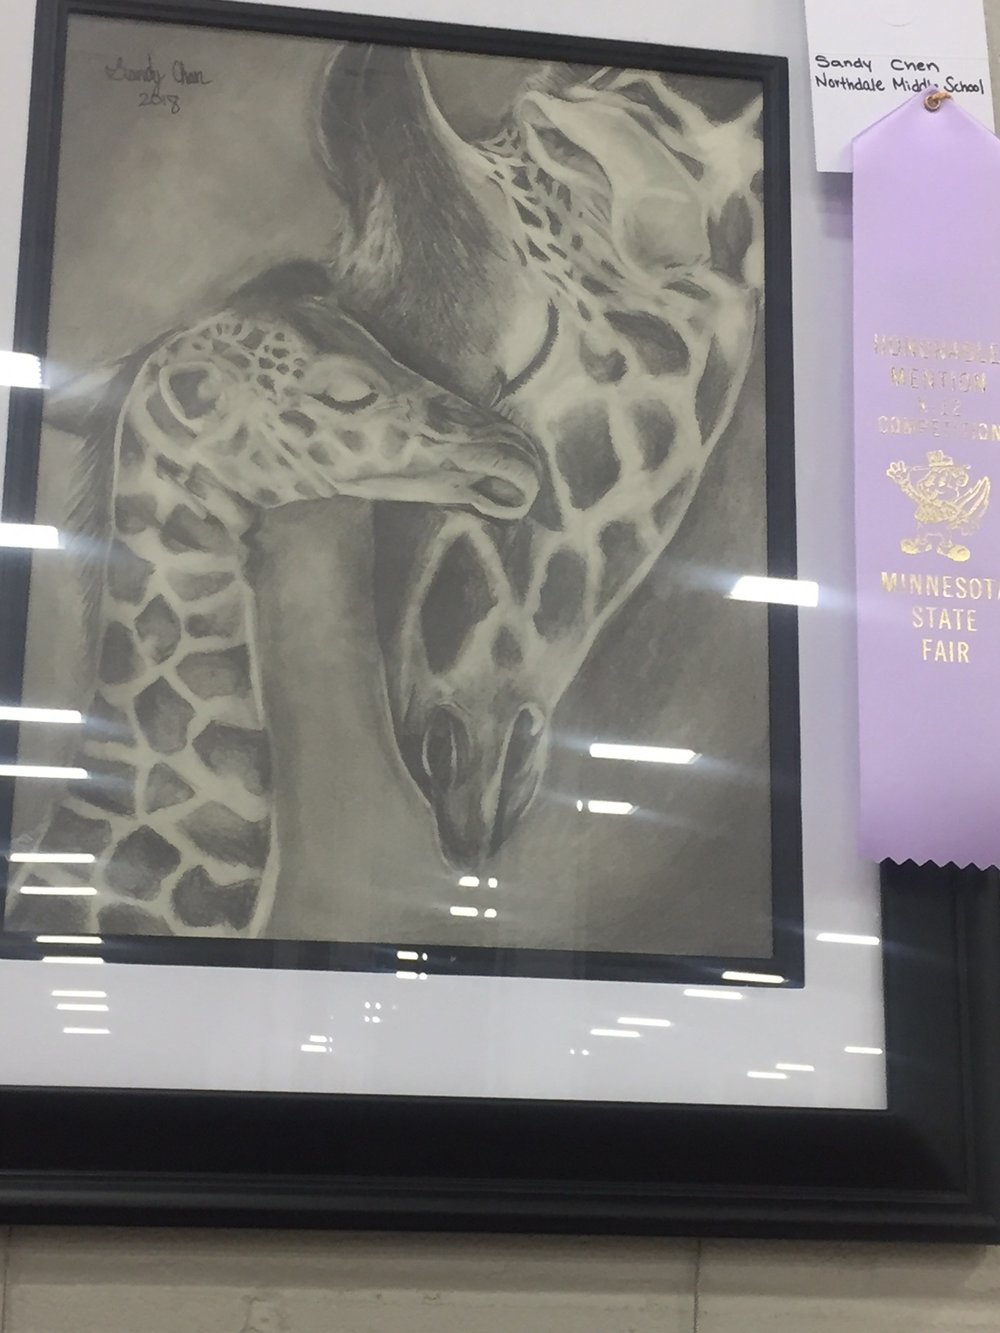 Grade 6 - Sandy Chen,Northdale Middle SchoolPencil Drawing-Giraffe